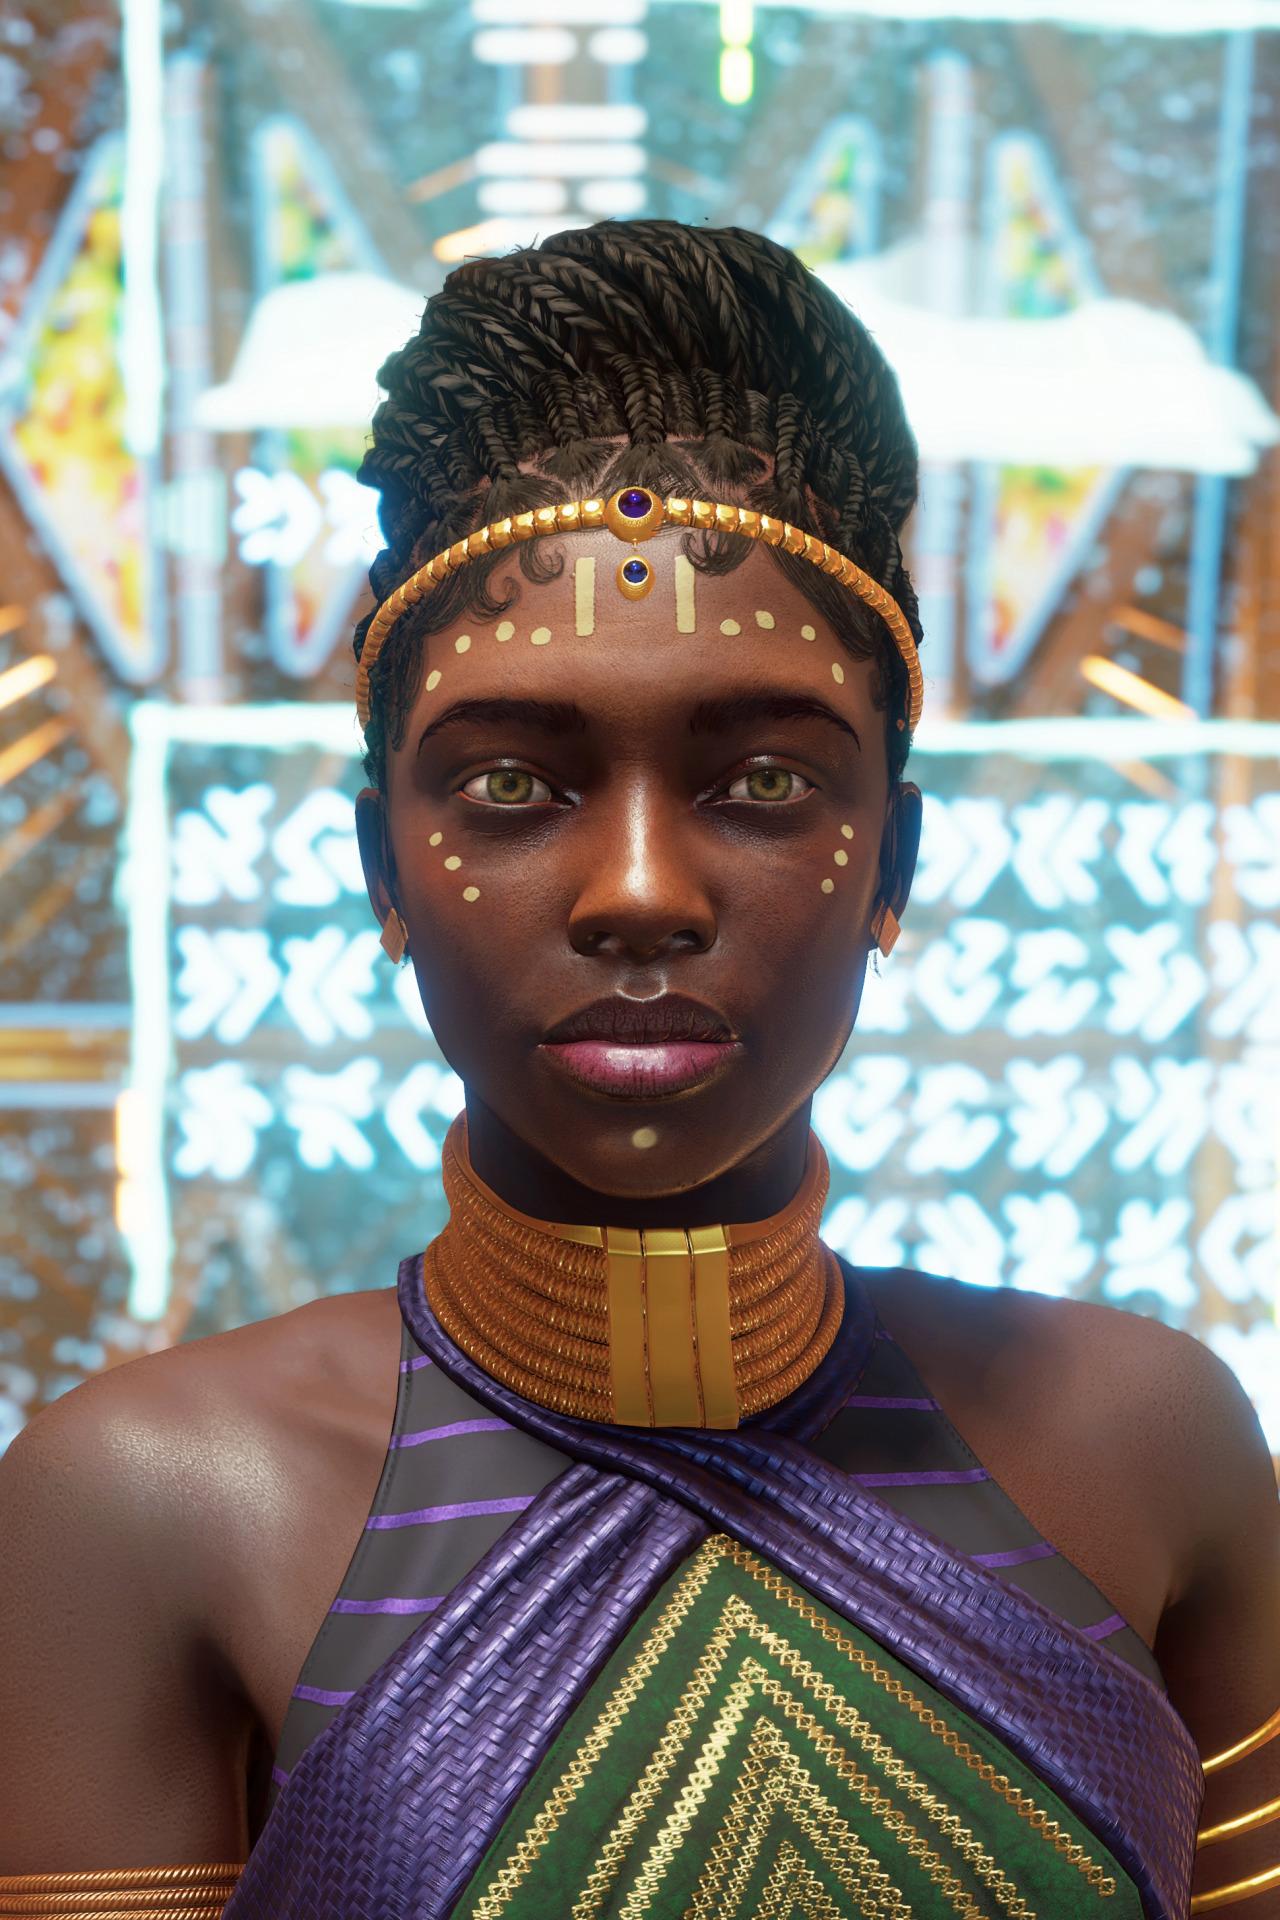 Princess Shuri #marvels avengers#marveledit#avengersedit#marvelsavengersedit#gamingedit#virtual photography#game photography#photomode#screenshot#ps5#shuri#mine